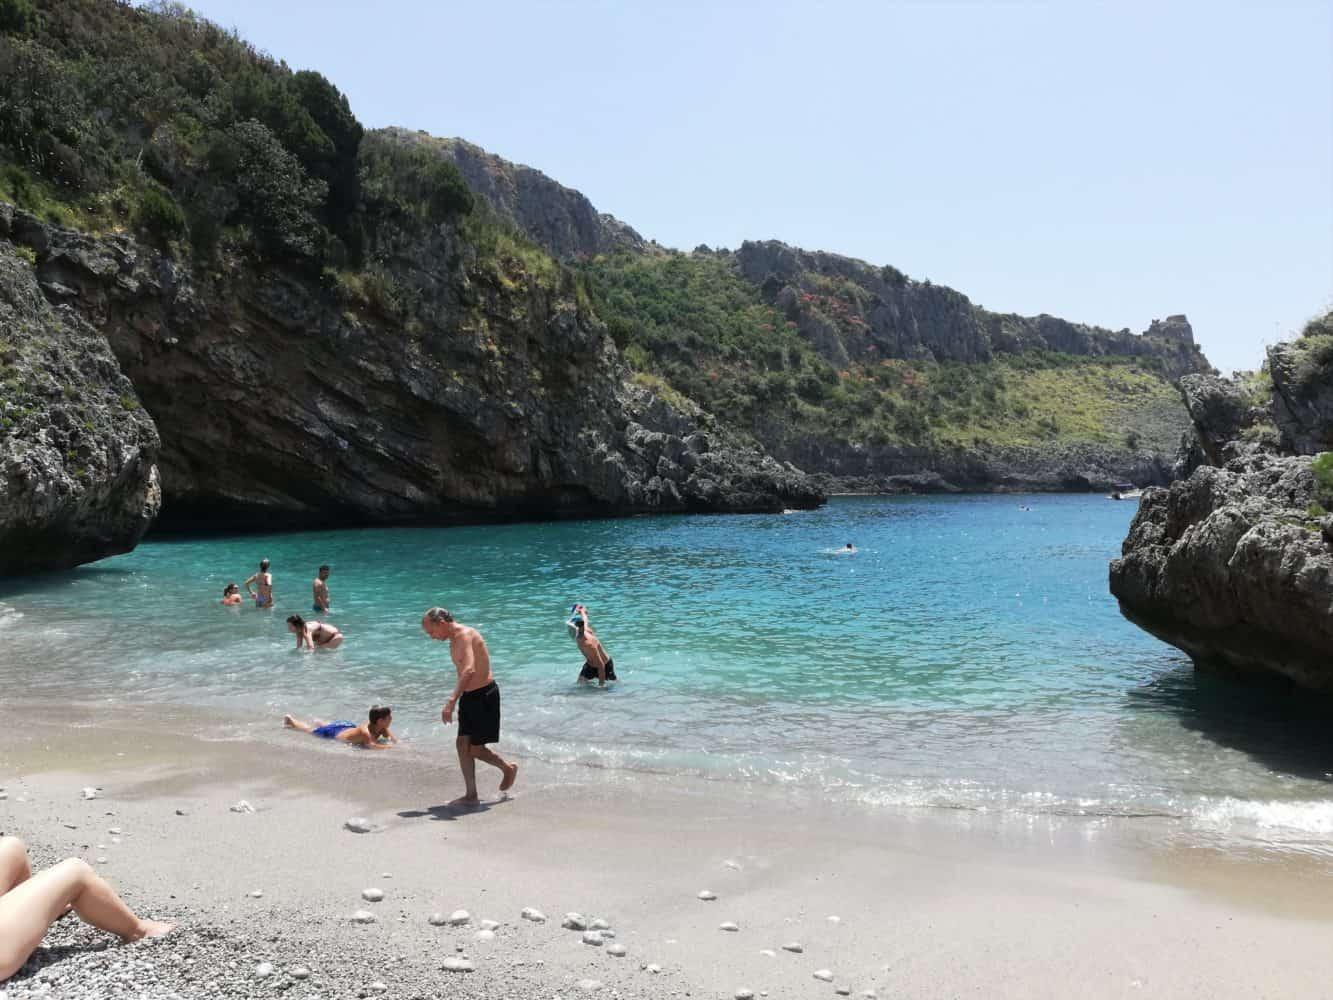 Spiaggia cala bianca, marina di camerota